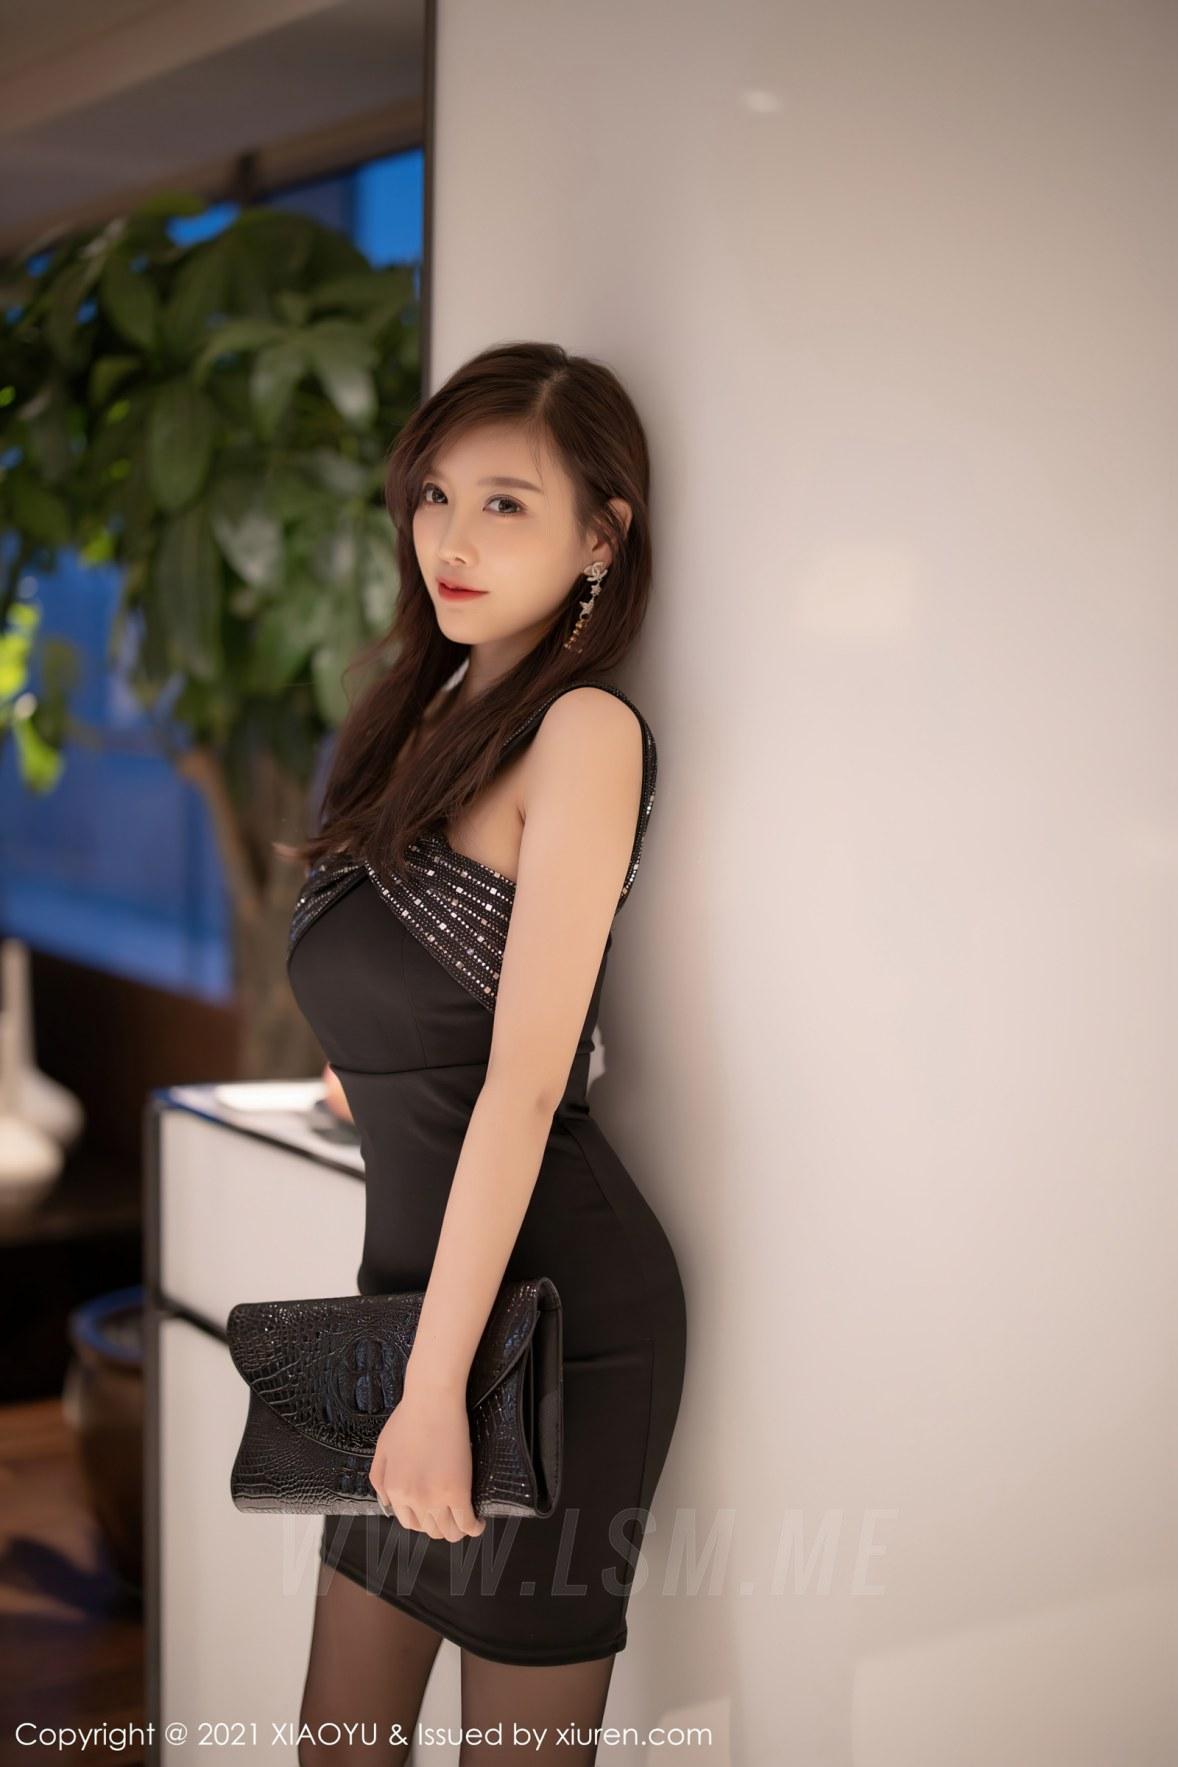 XIAOYU  语画界 Vol.509 曼妙灵动 杨晨晨sugar 别致身姿妩媚动人 - 1